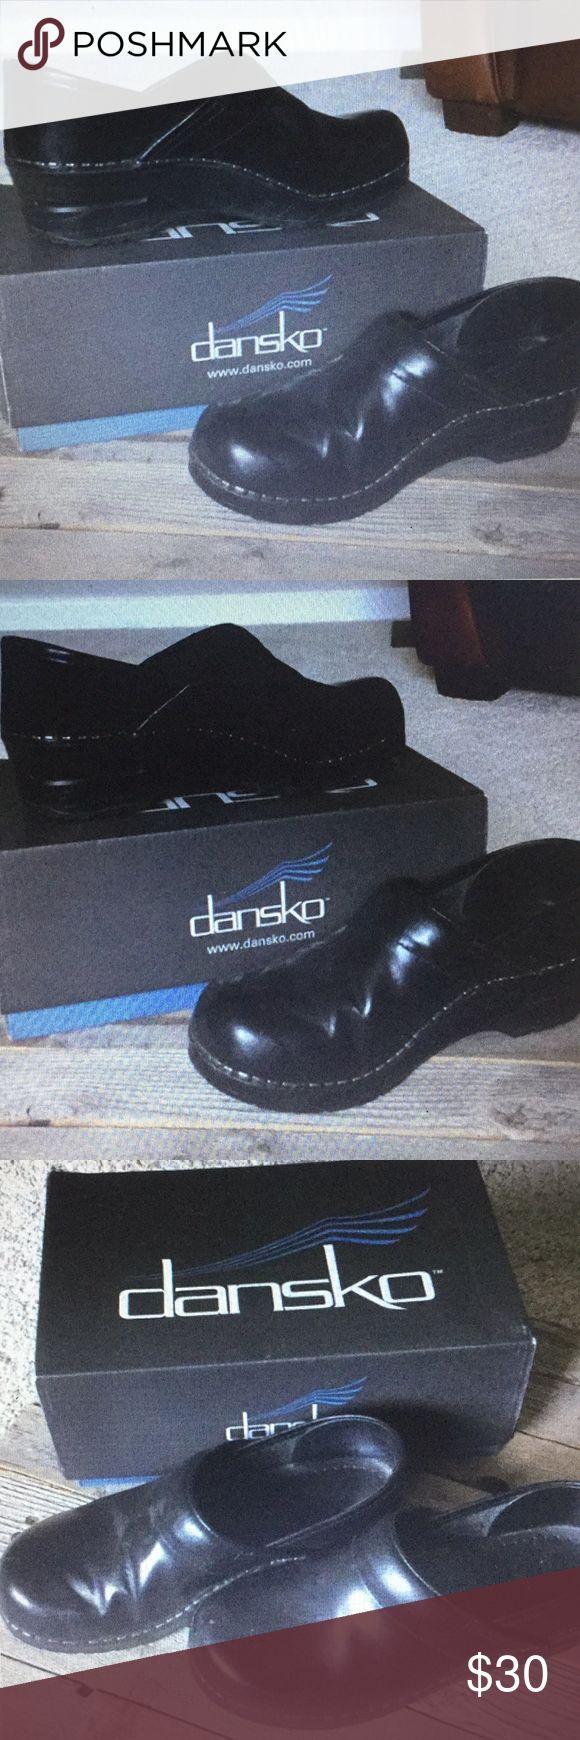 Dansko Professional Cabrio Dansko Black Shoes in good condition. Cabrio very com…